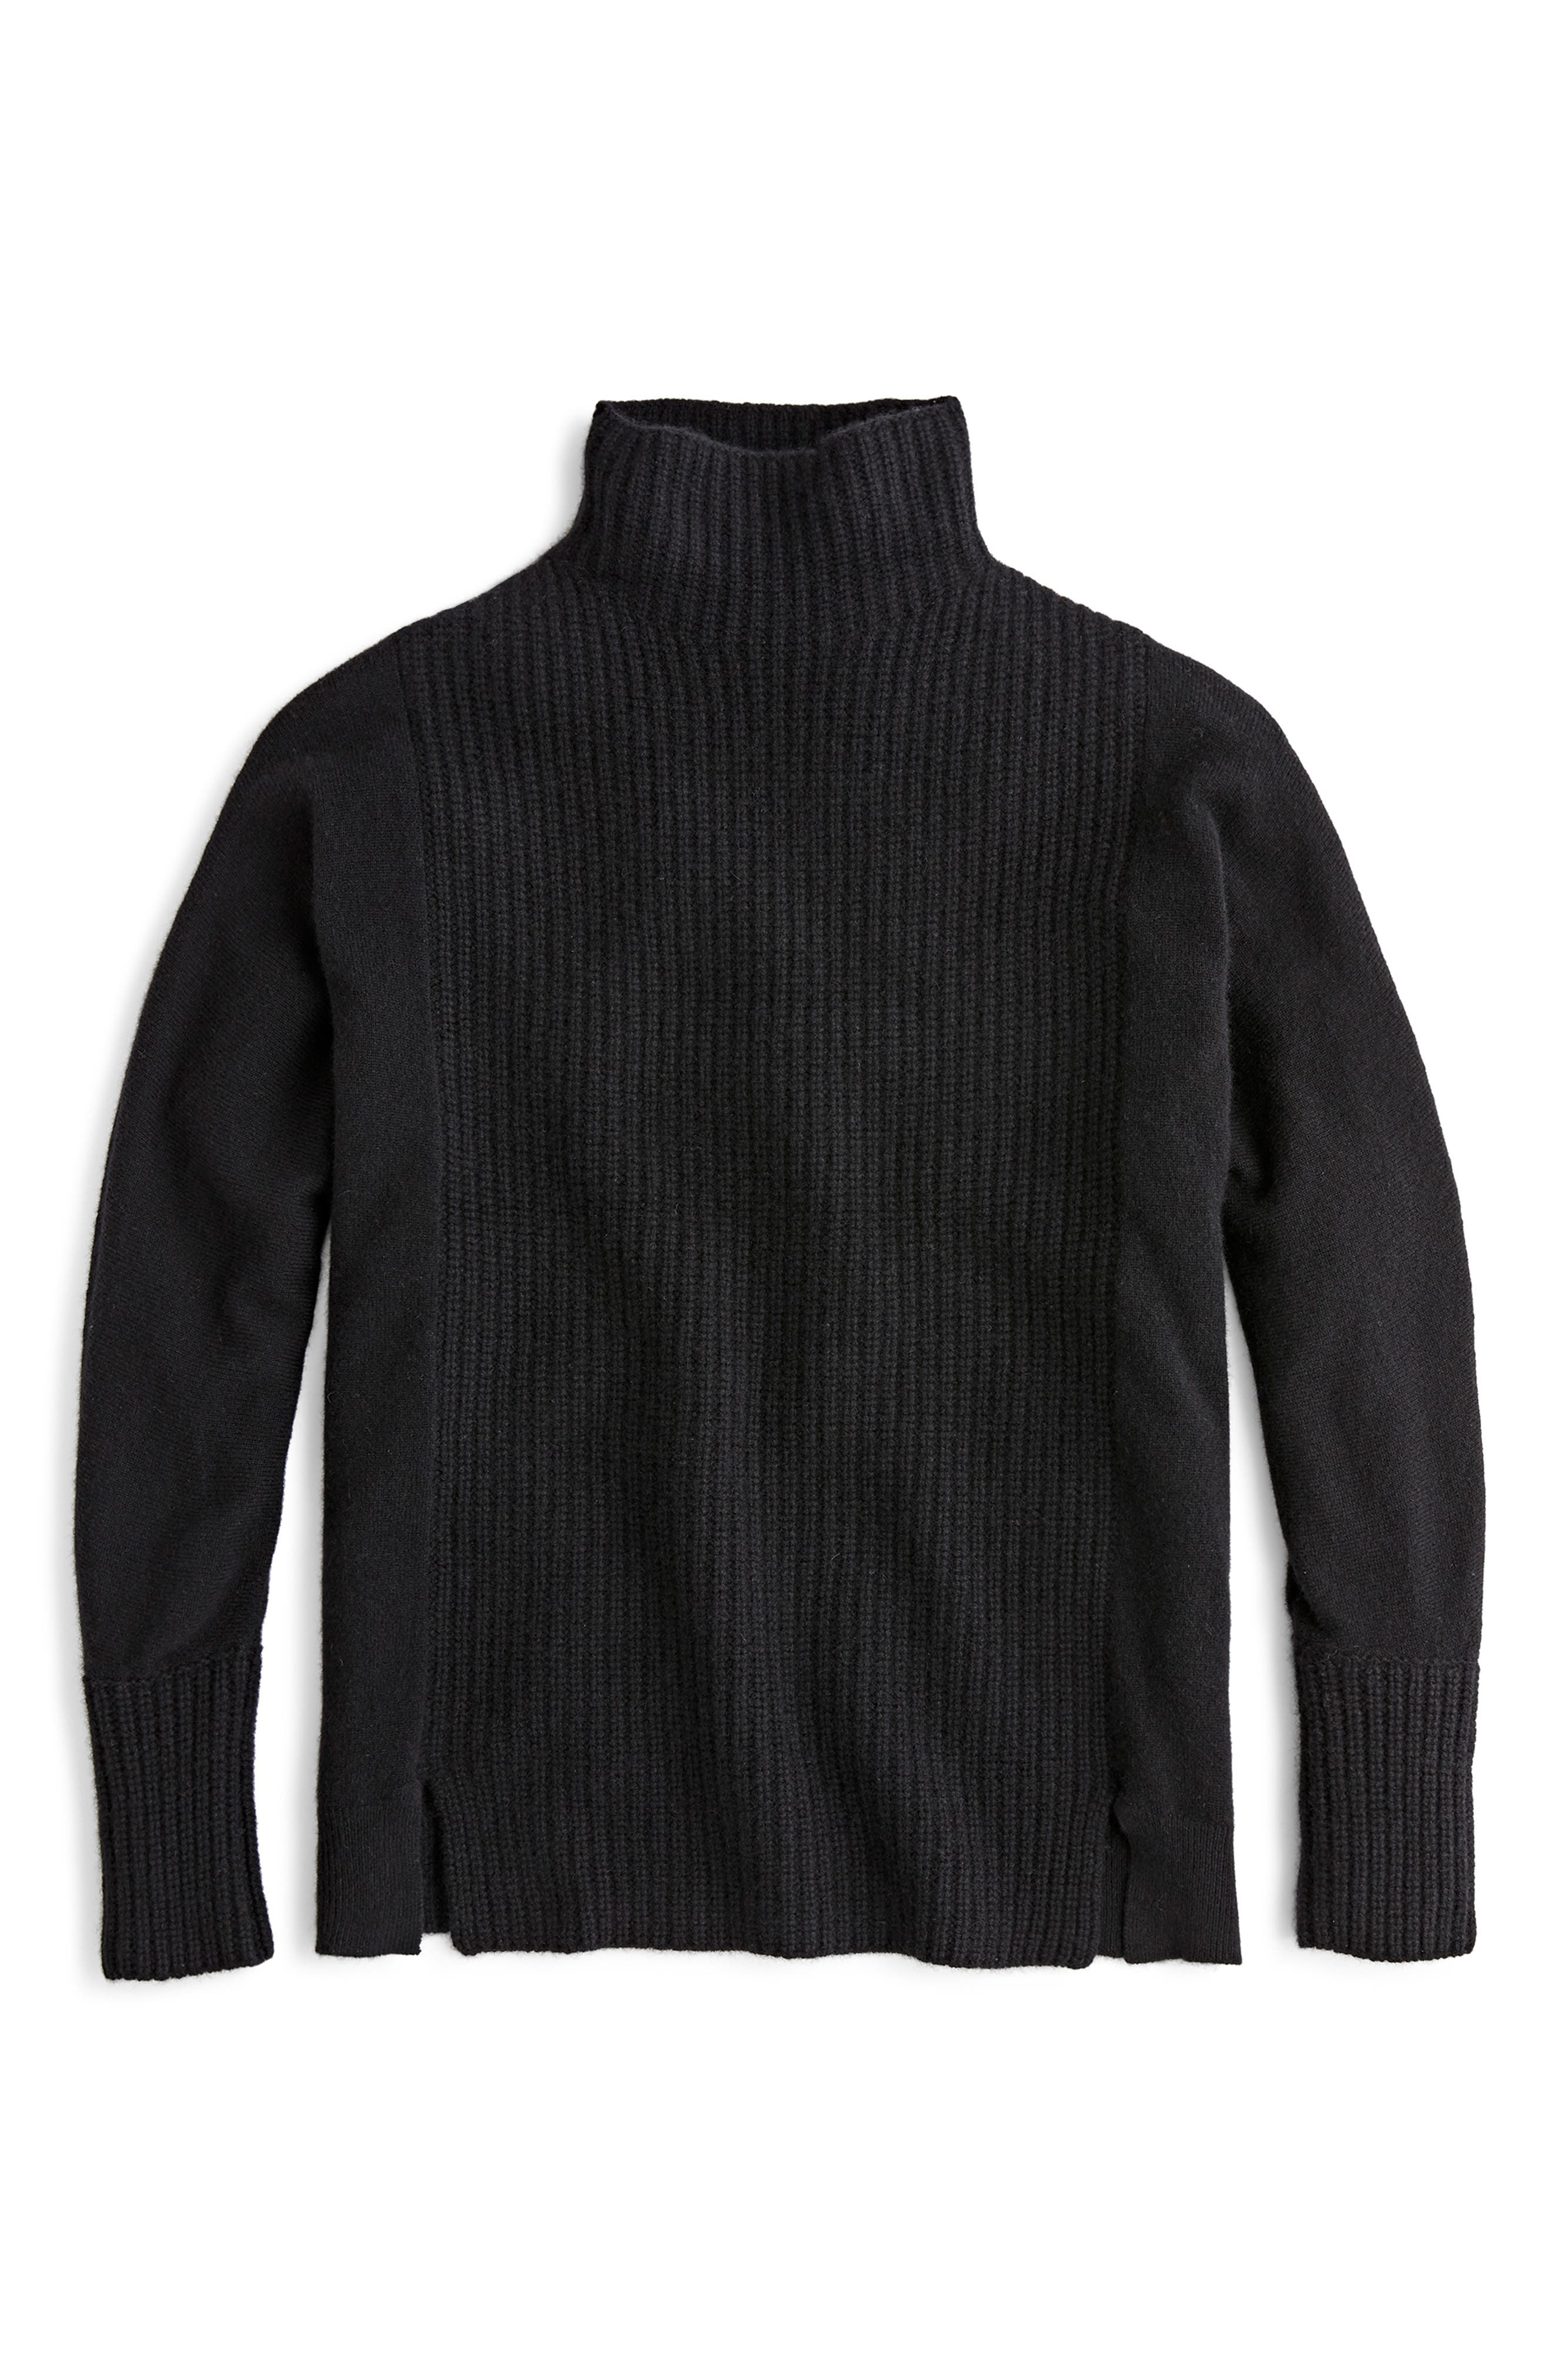 J.CREW,                             Mock Neck Cashmere Sweater,                             Main thumbnail 1, color,                             BLACK